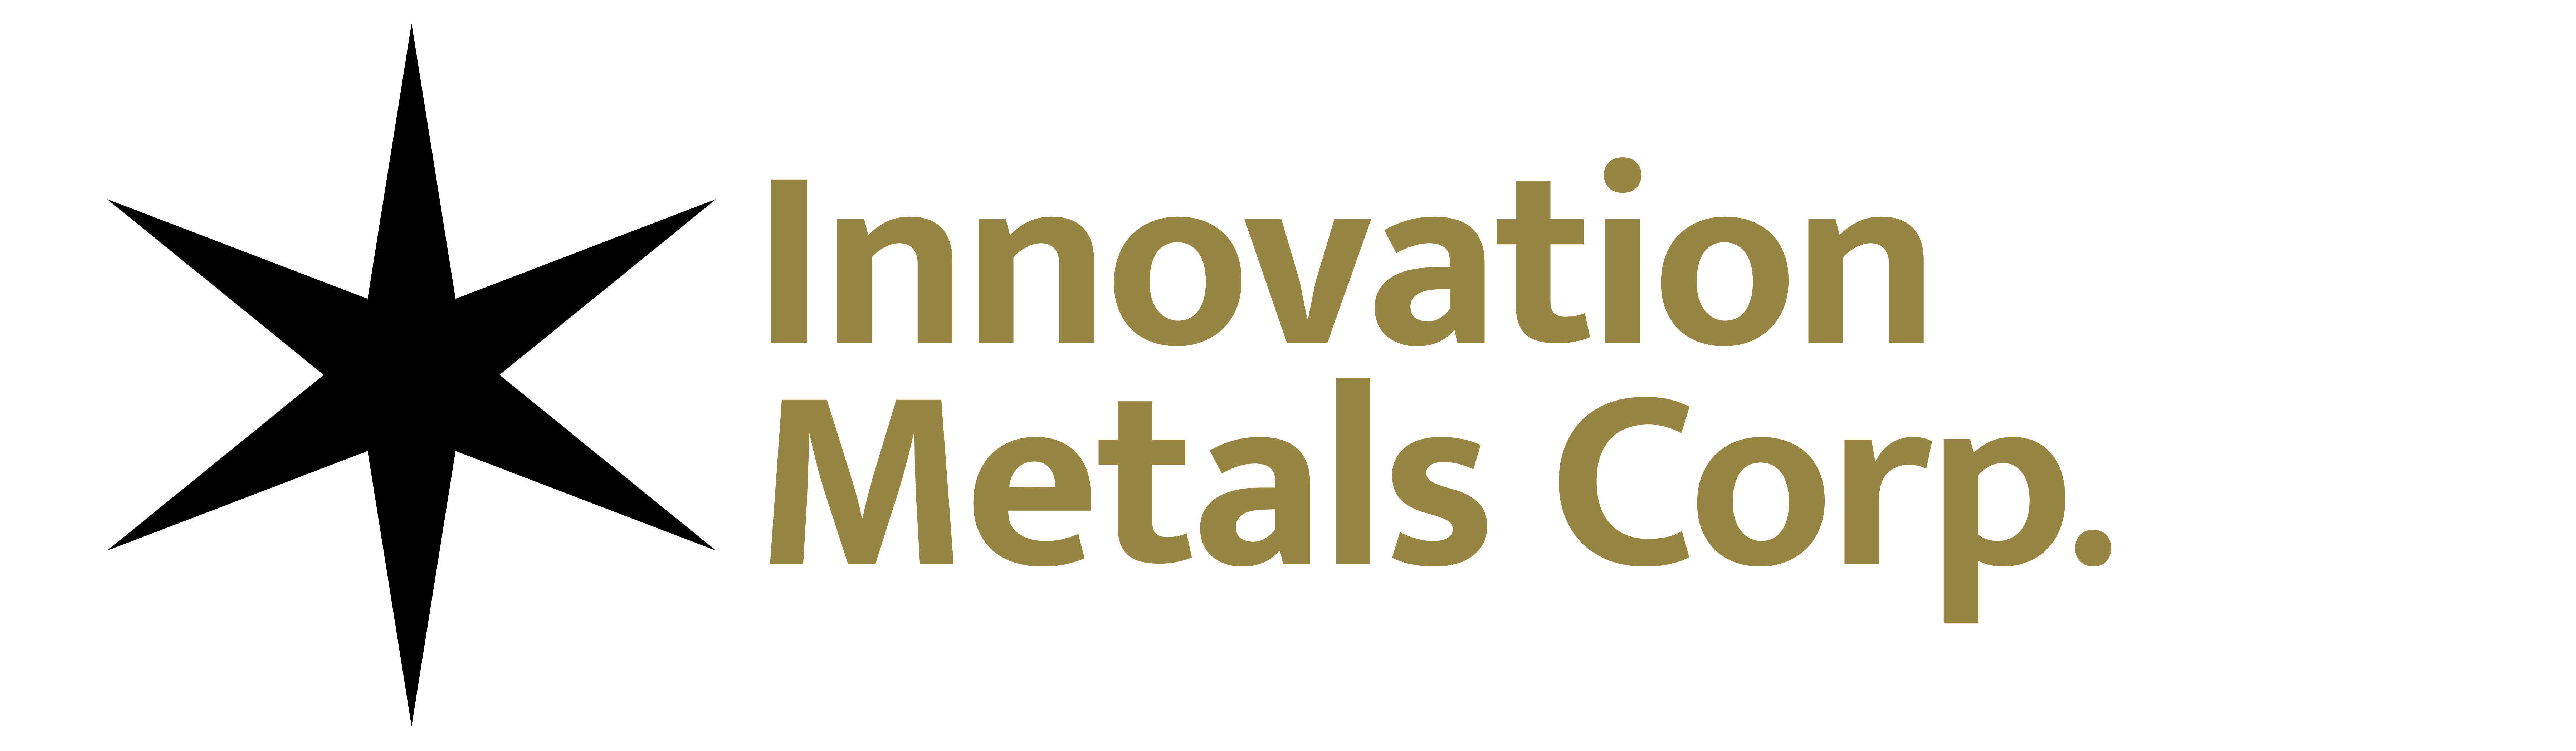 Innovation Metals Corp